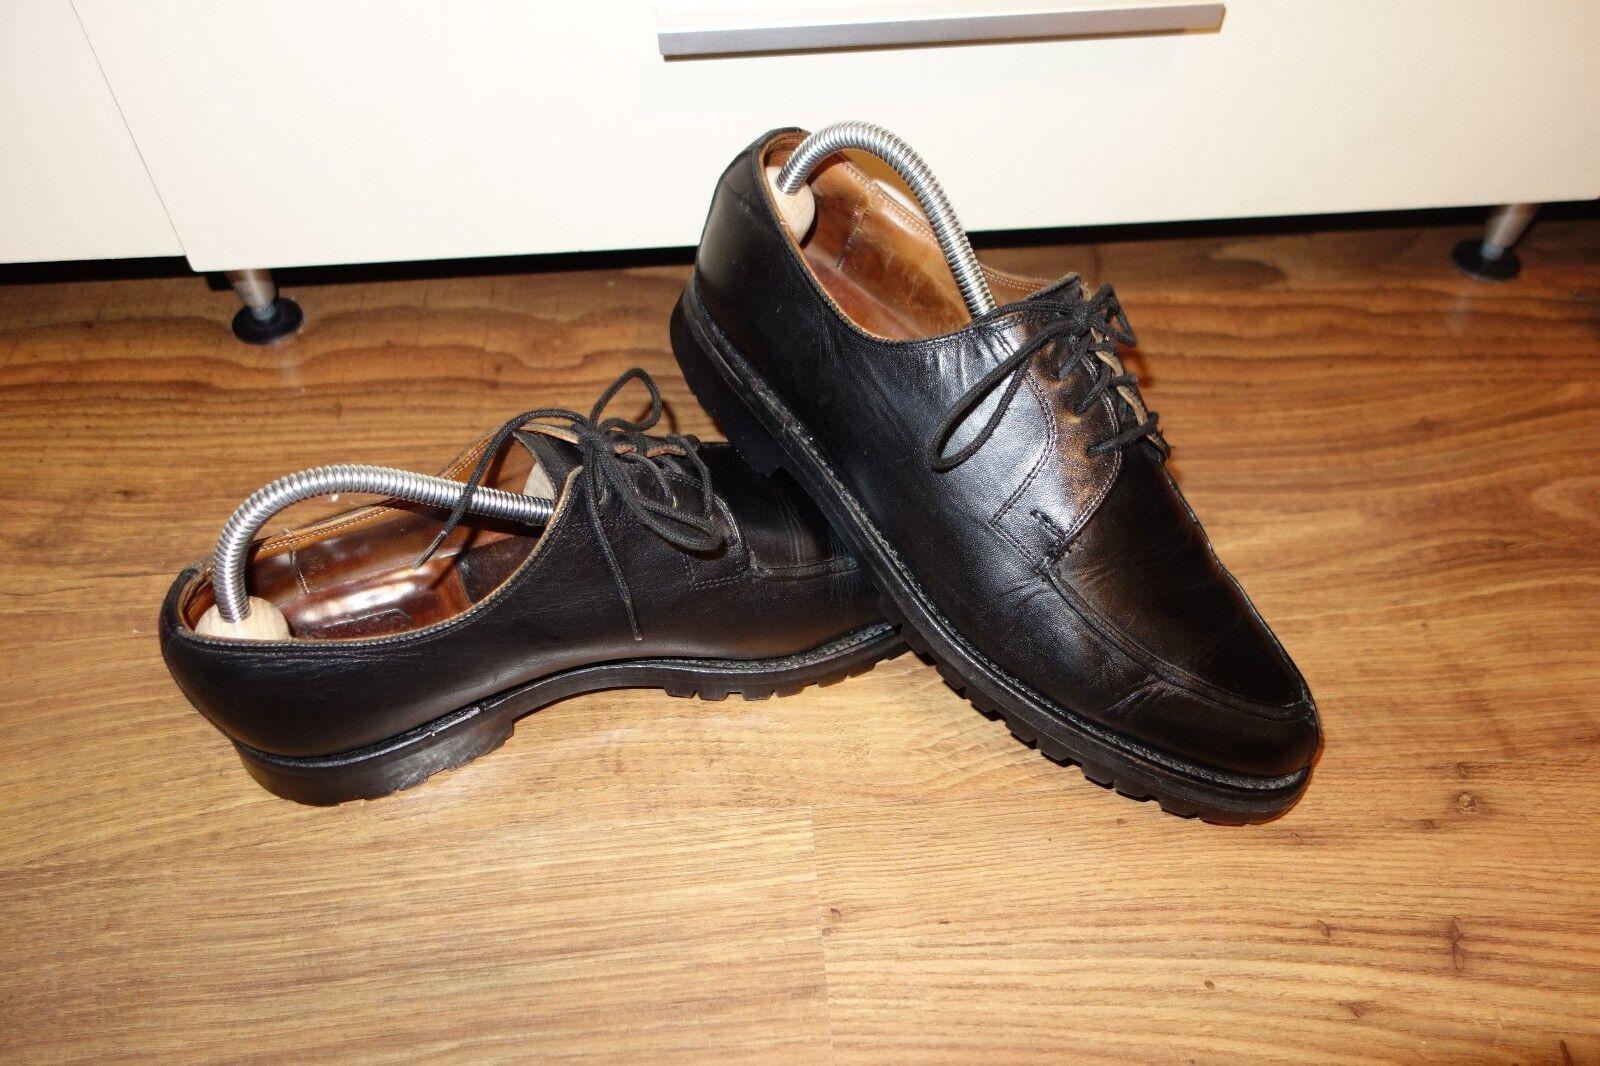 LUDWIG REITER WIEN Schuhe, 8.5, SIZE UK 7.5, US 8.5, Schuhe, EU 41.5, VERY GOOD CONDITION 6313ee